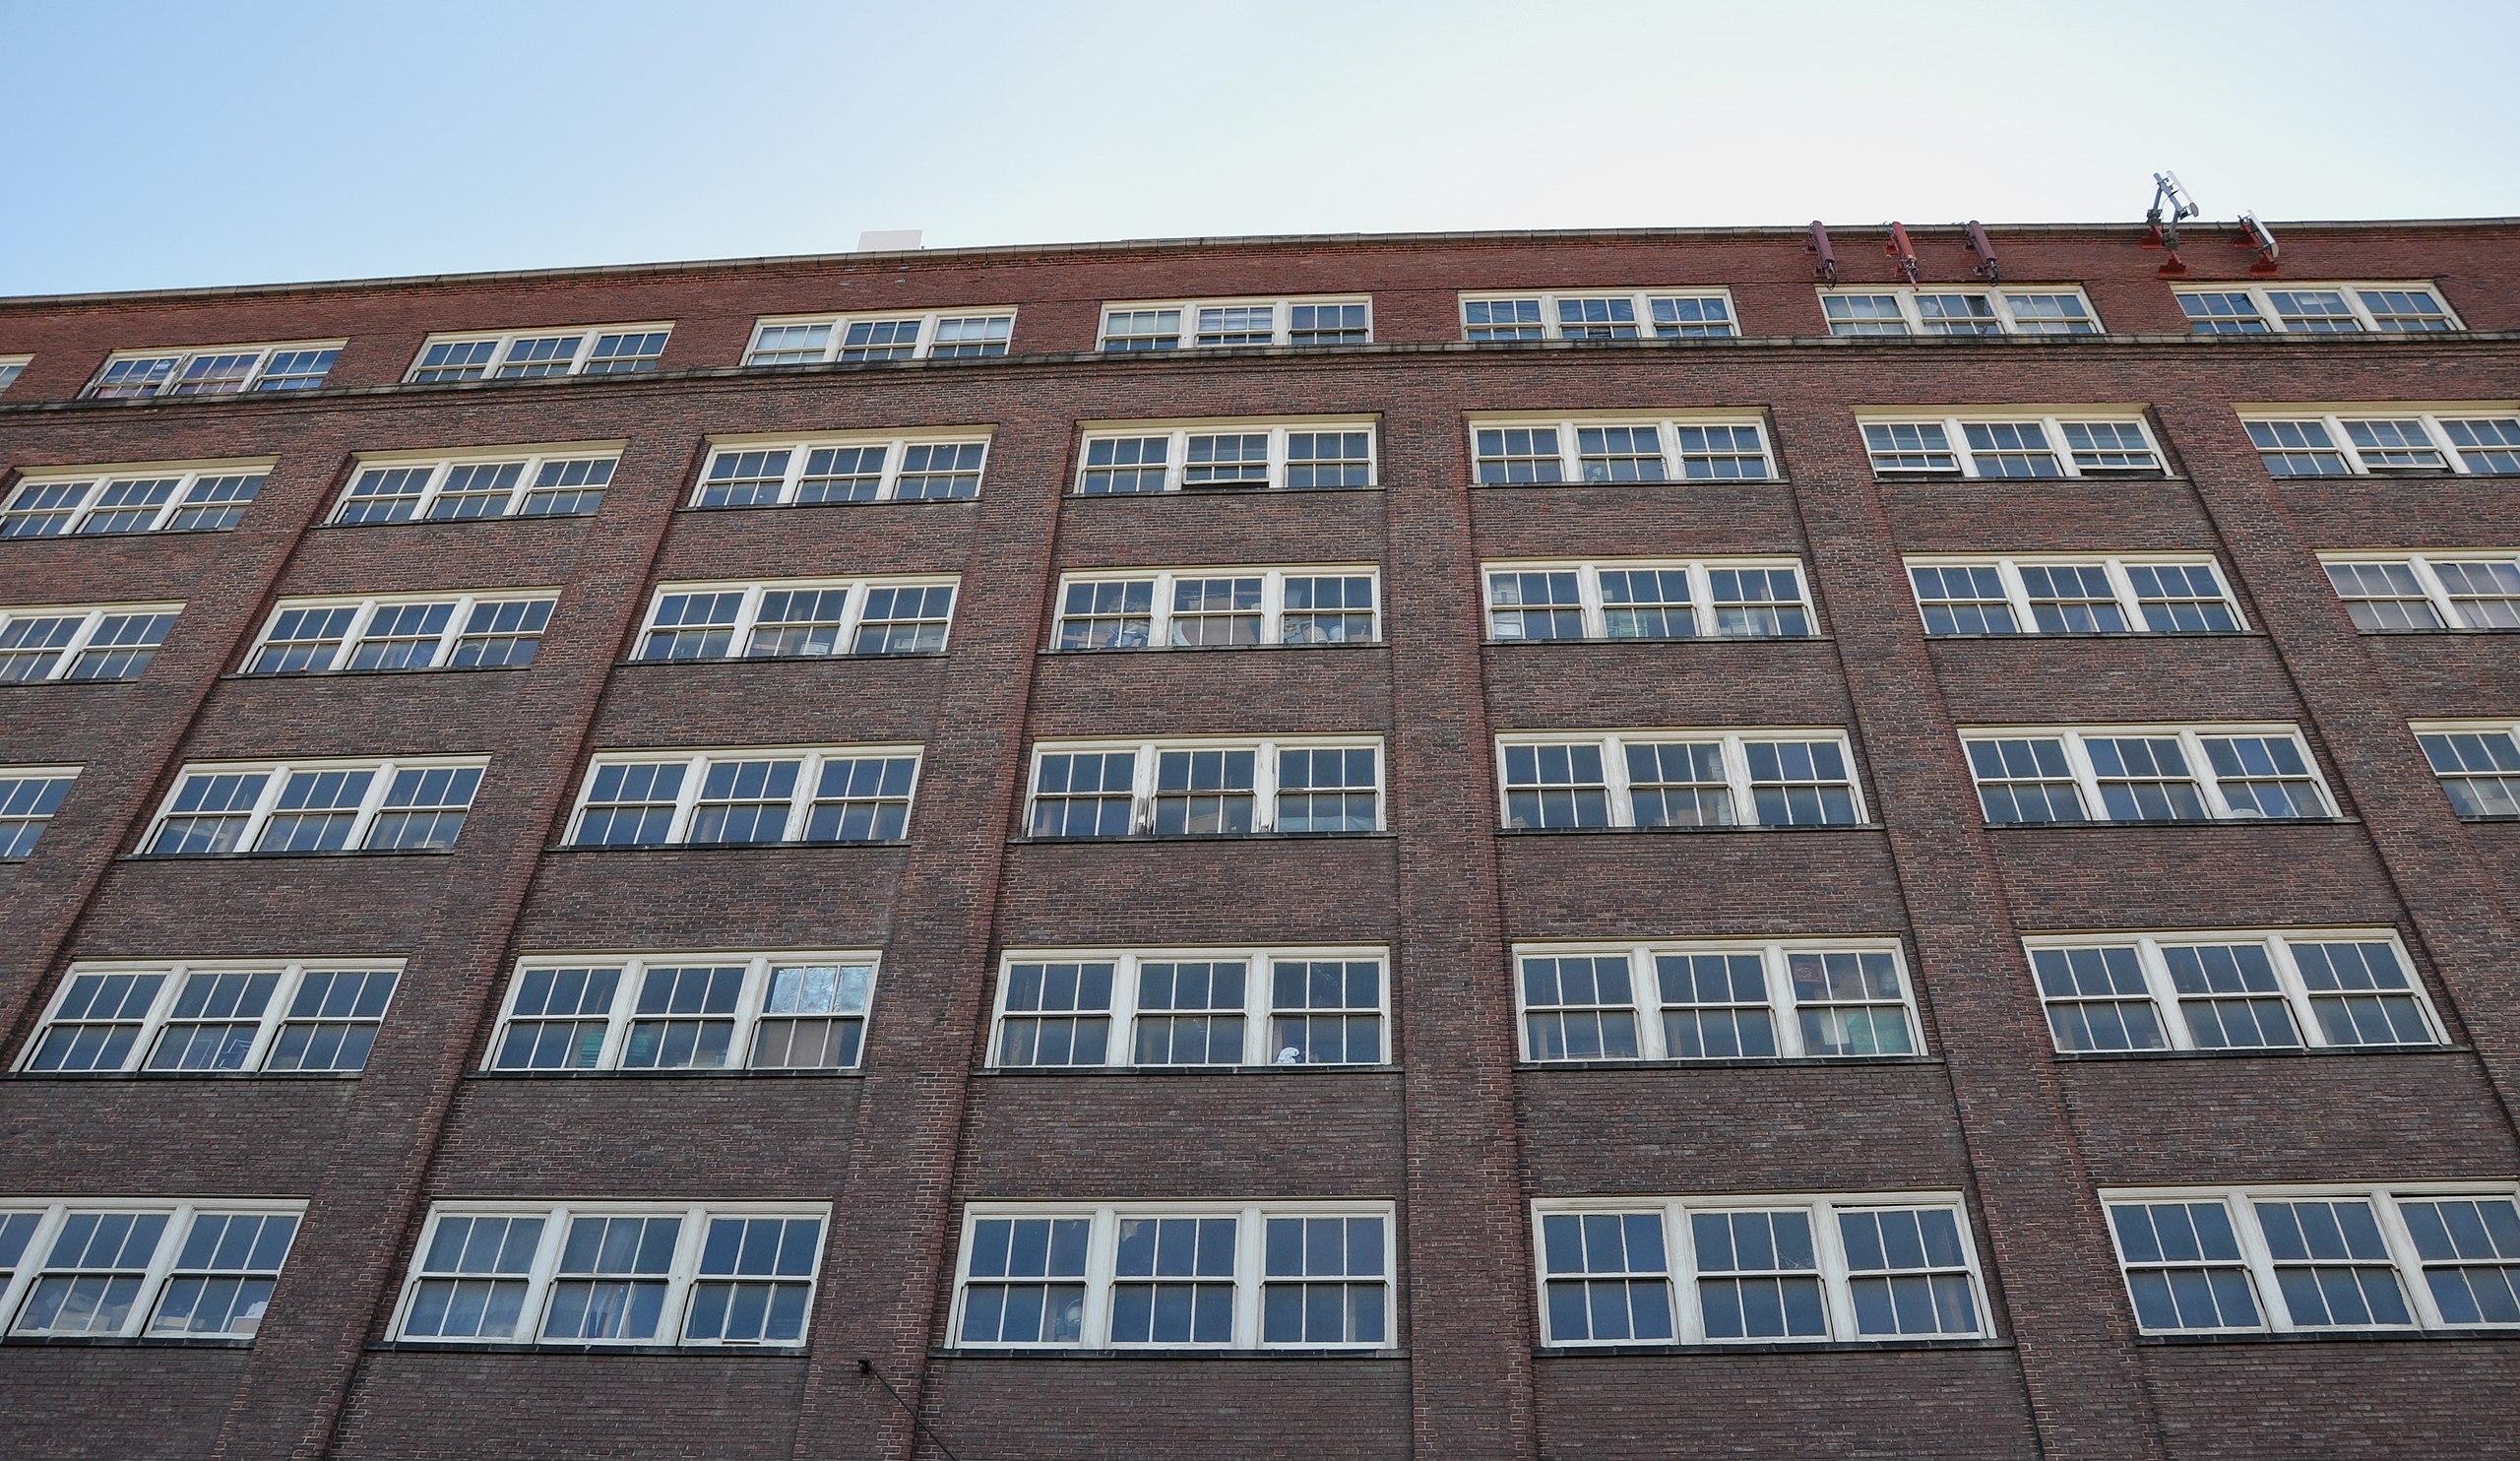 John Deere Plow Company Building